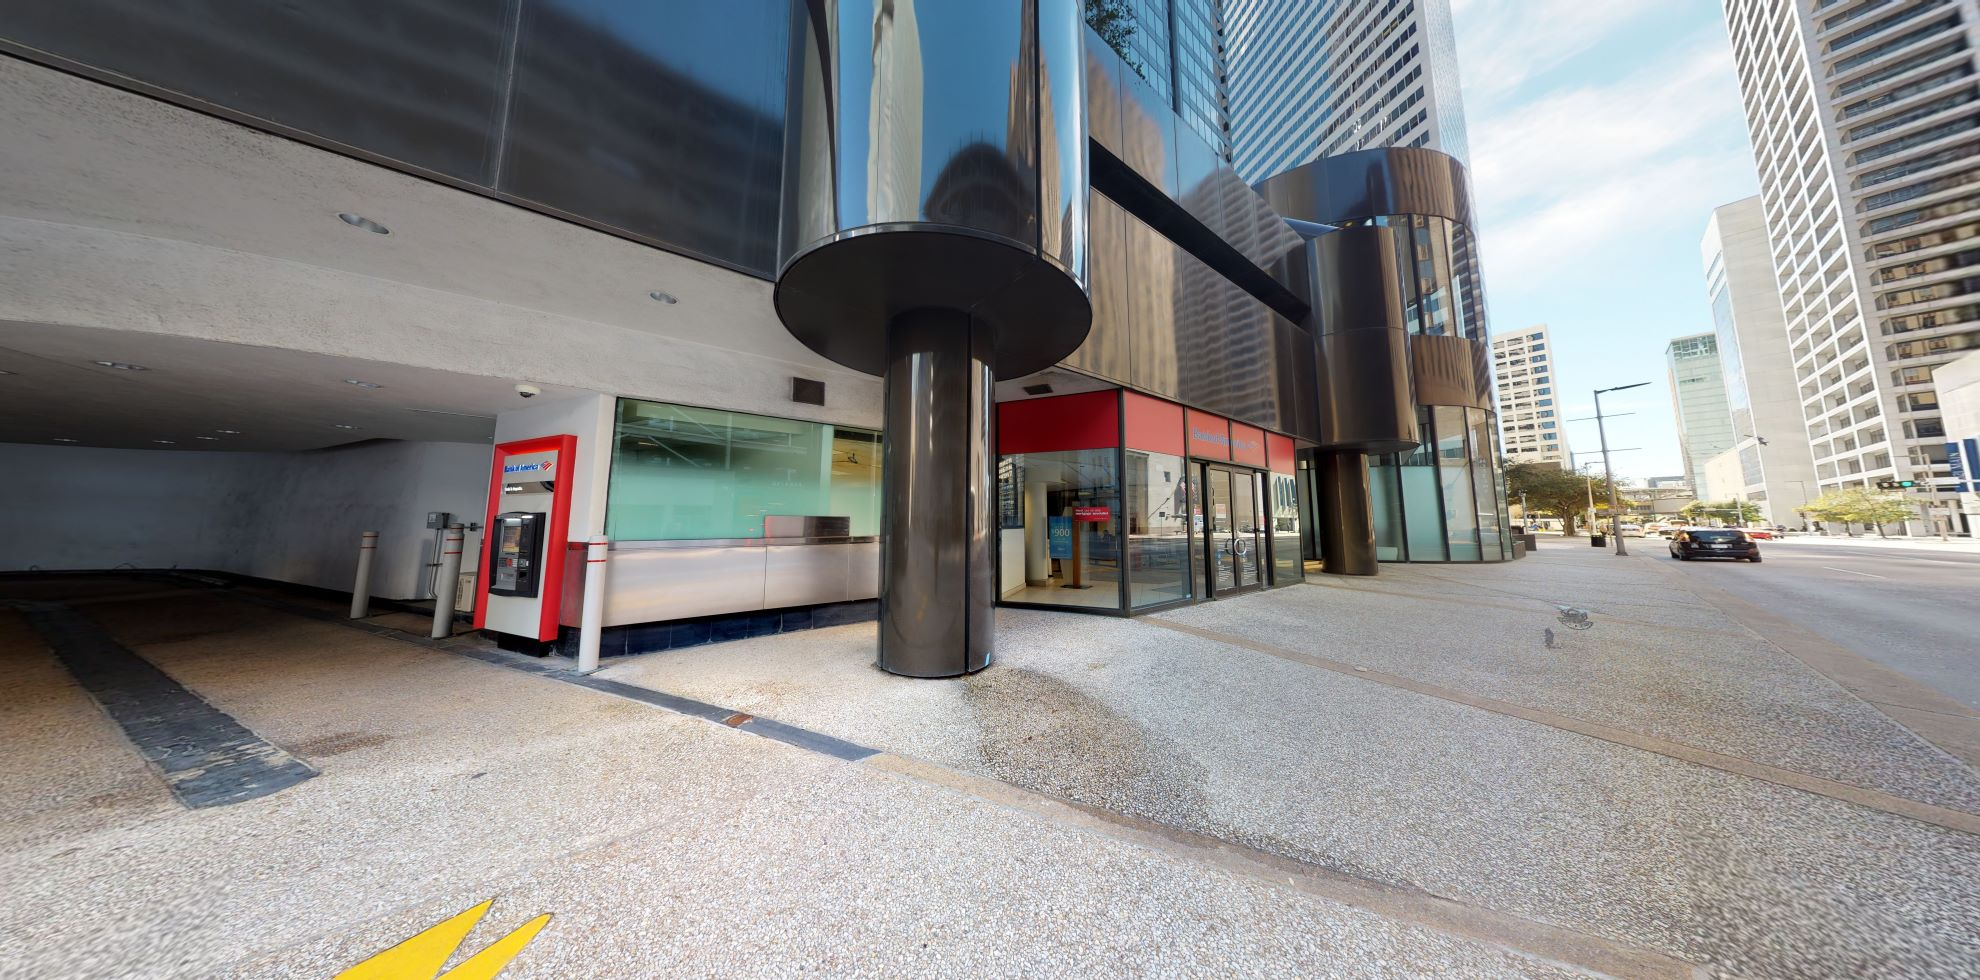 Bank of America financial center with drive-thru ATM   909 Fannin St STE G100, Houston, TX 77010